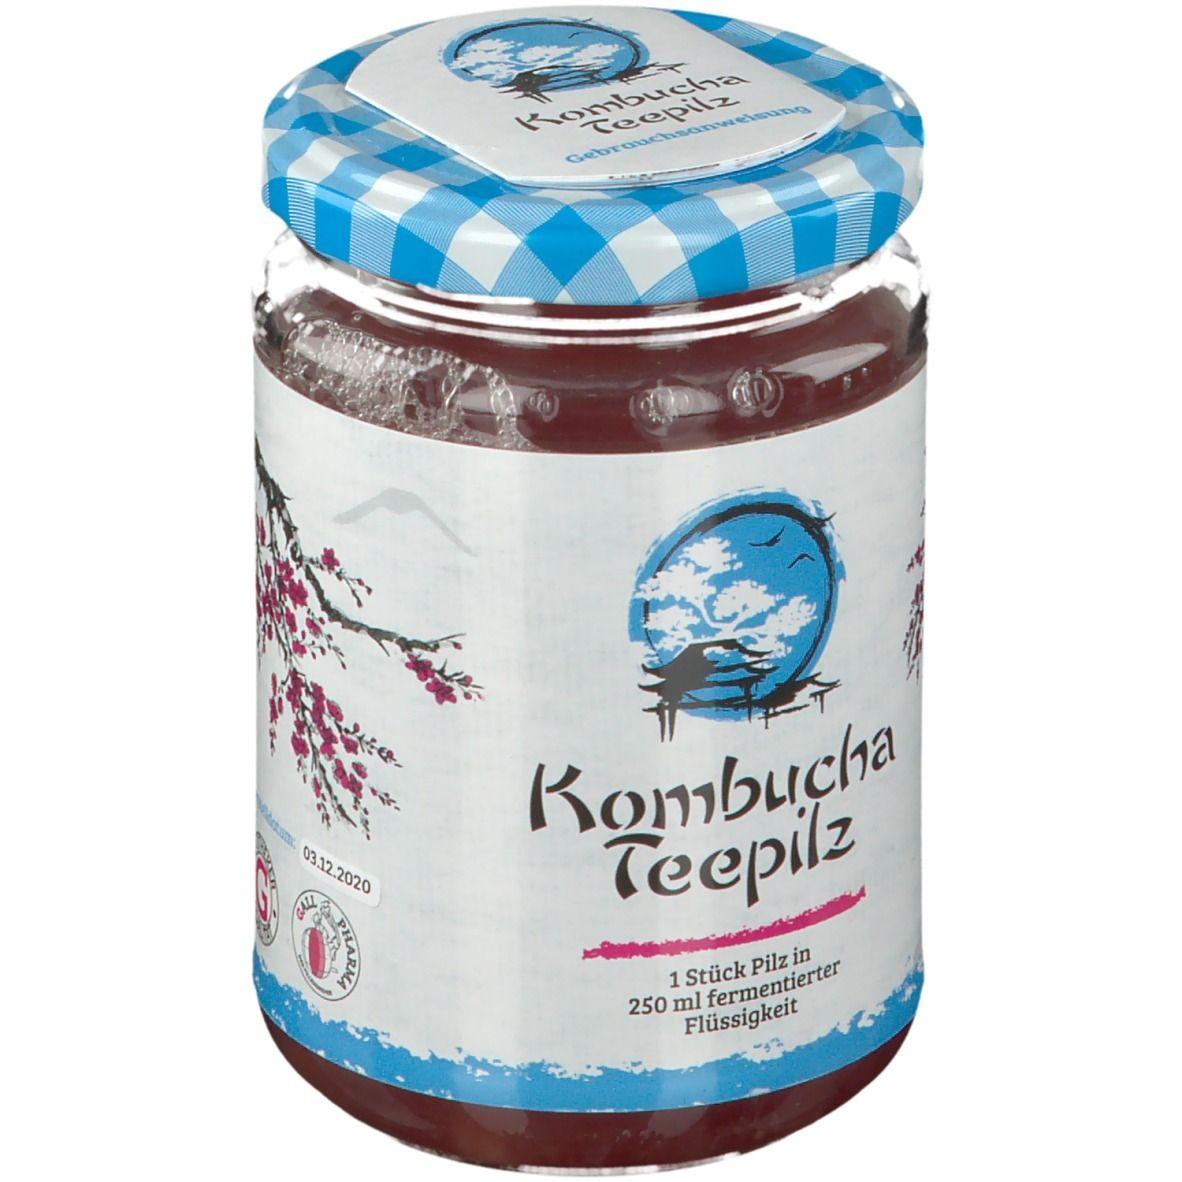 GALL PHARMA Kombucha Teepilz